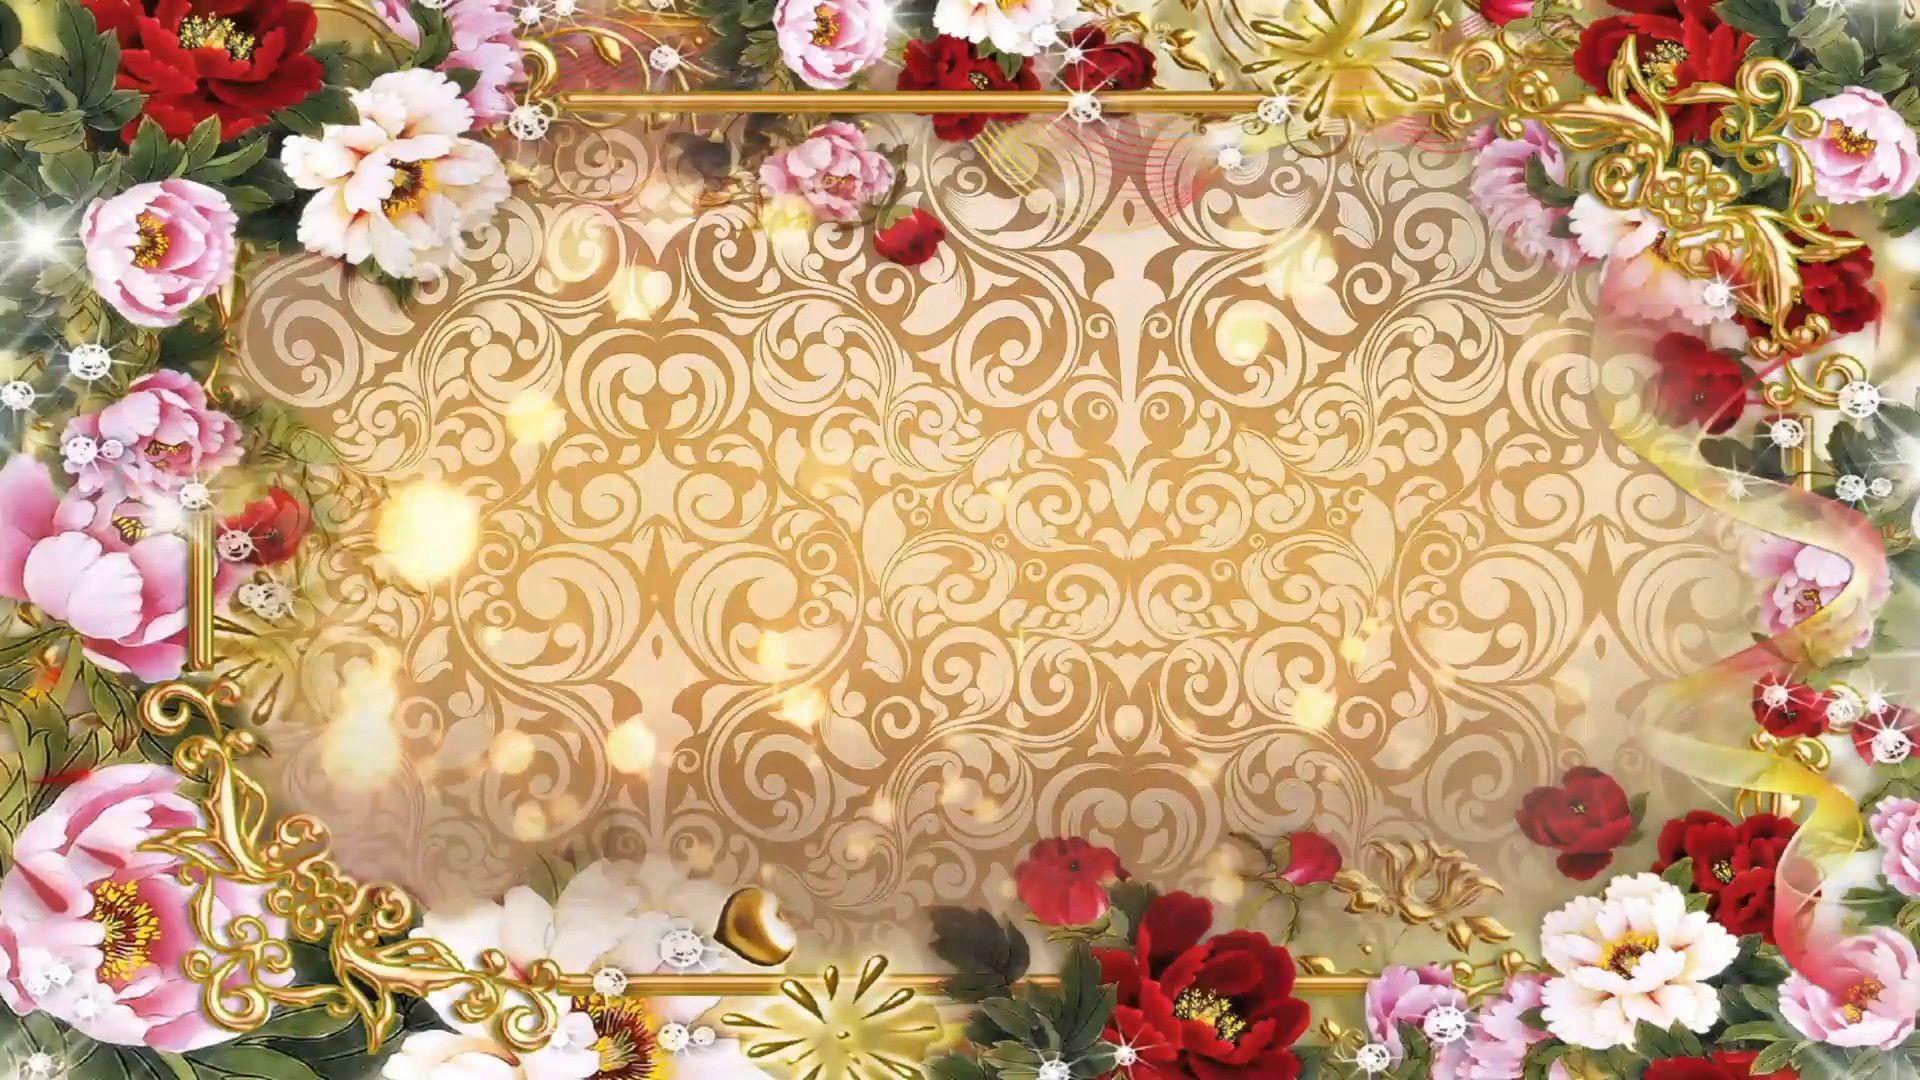 Wedding Background Wallpaper 65 Images